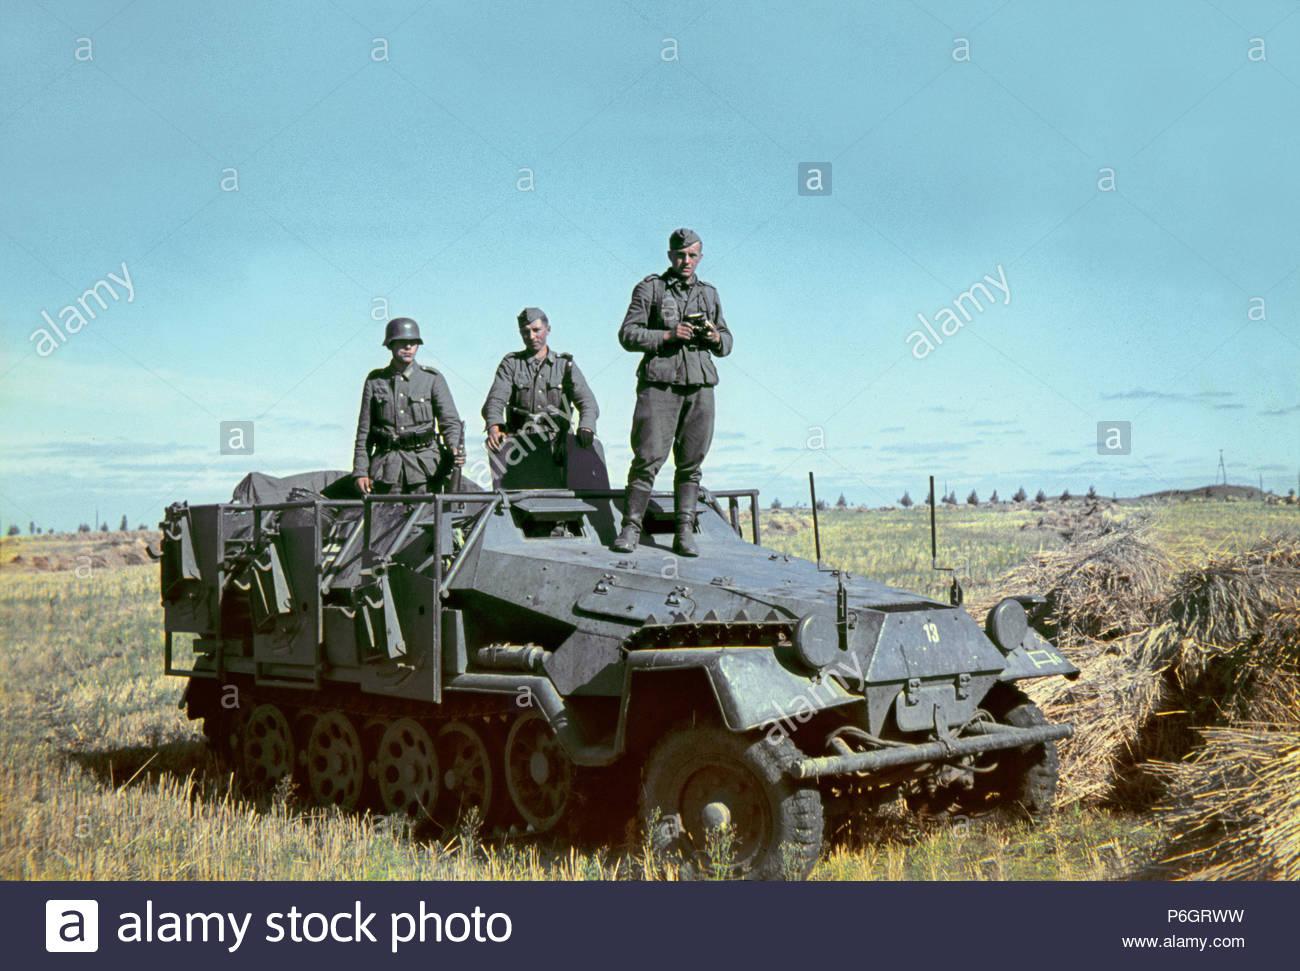 German Army Half track 251 14th Panzer Divison Russia Don 1942 Stalingrad mg 42 ostfront camera kamera 13 13th fully motorised company - Stock Image